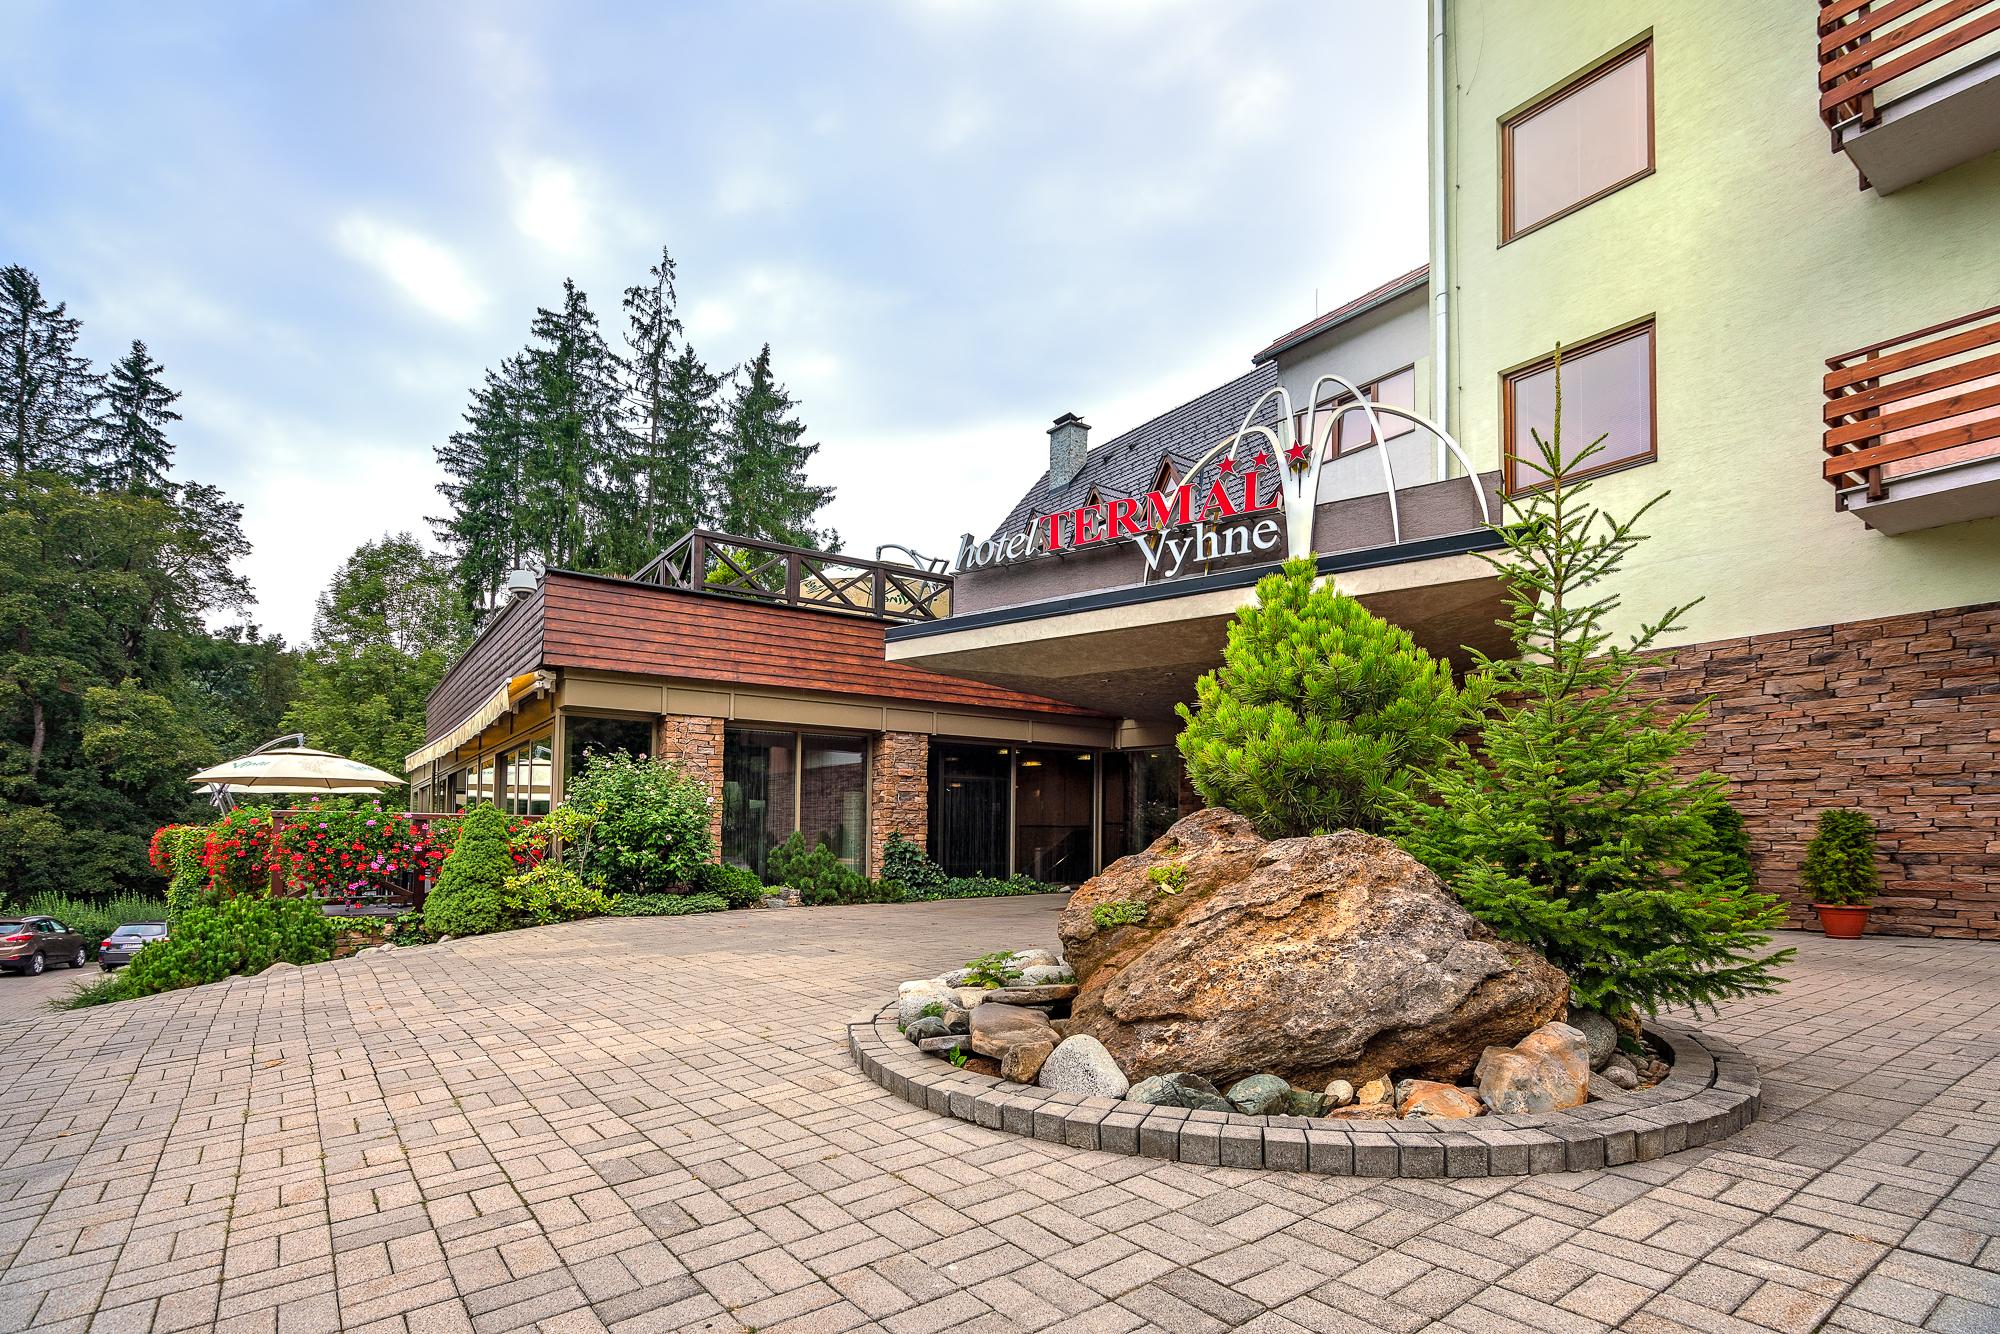 https://cms.satur.sk/data/imgs/tour_image/orig/hotel_termal_vyhne-19-1802504.jpg